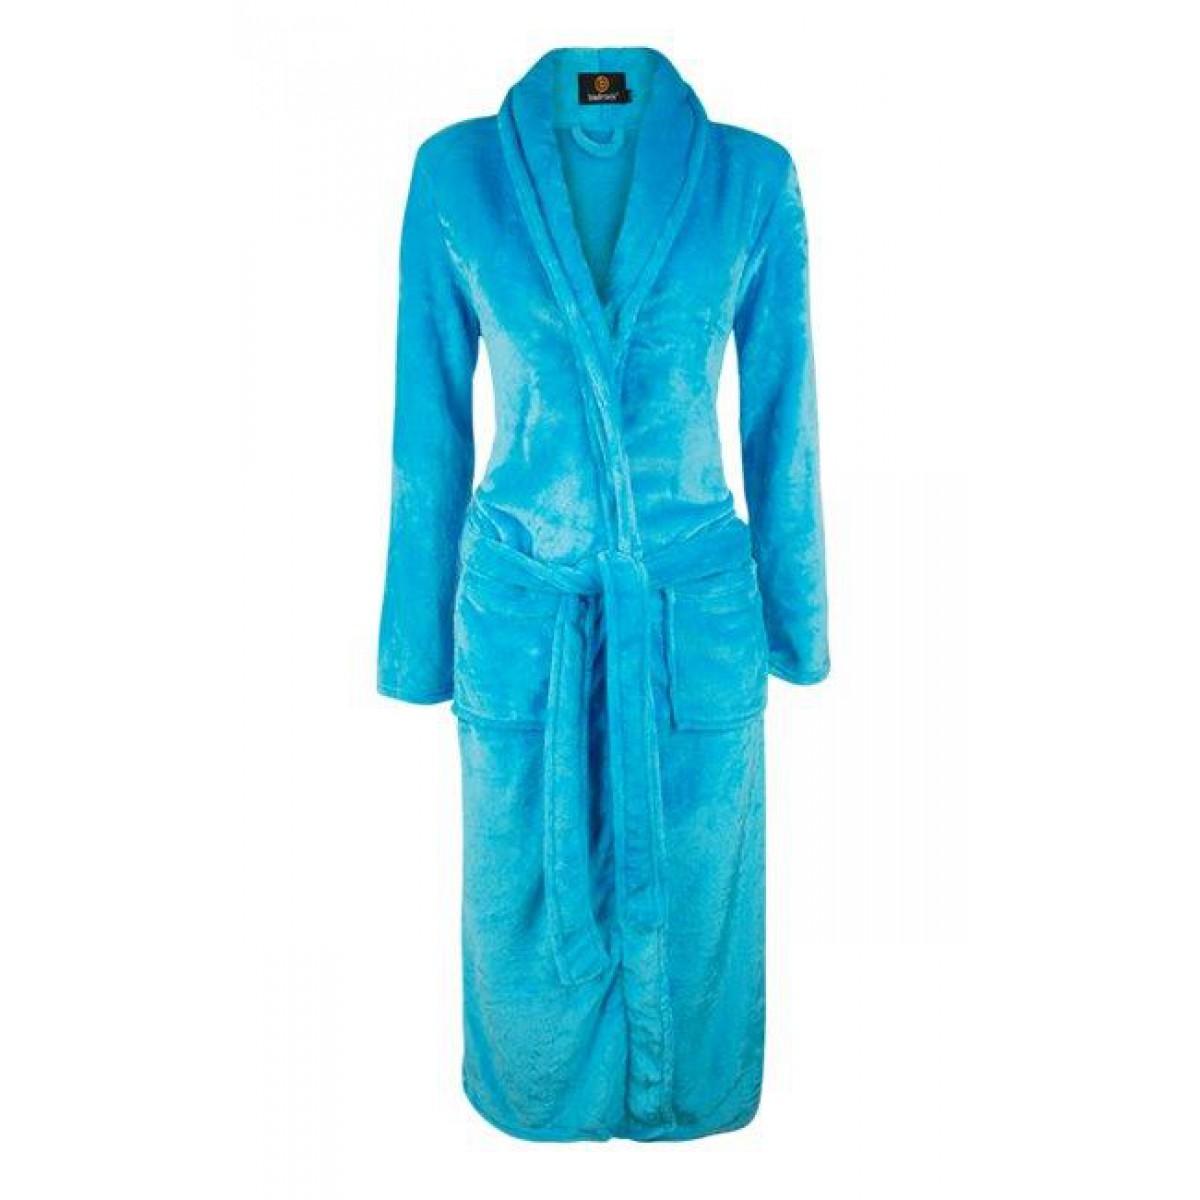 Aquablauwe damesbadjas